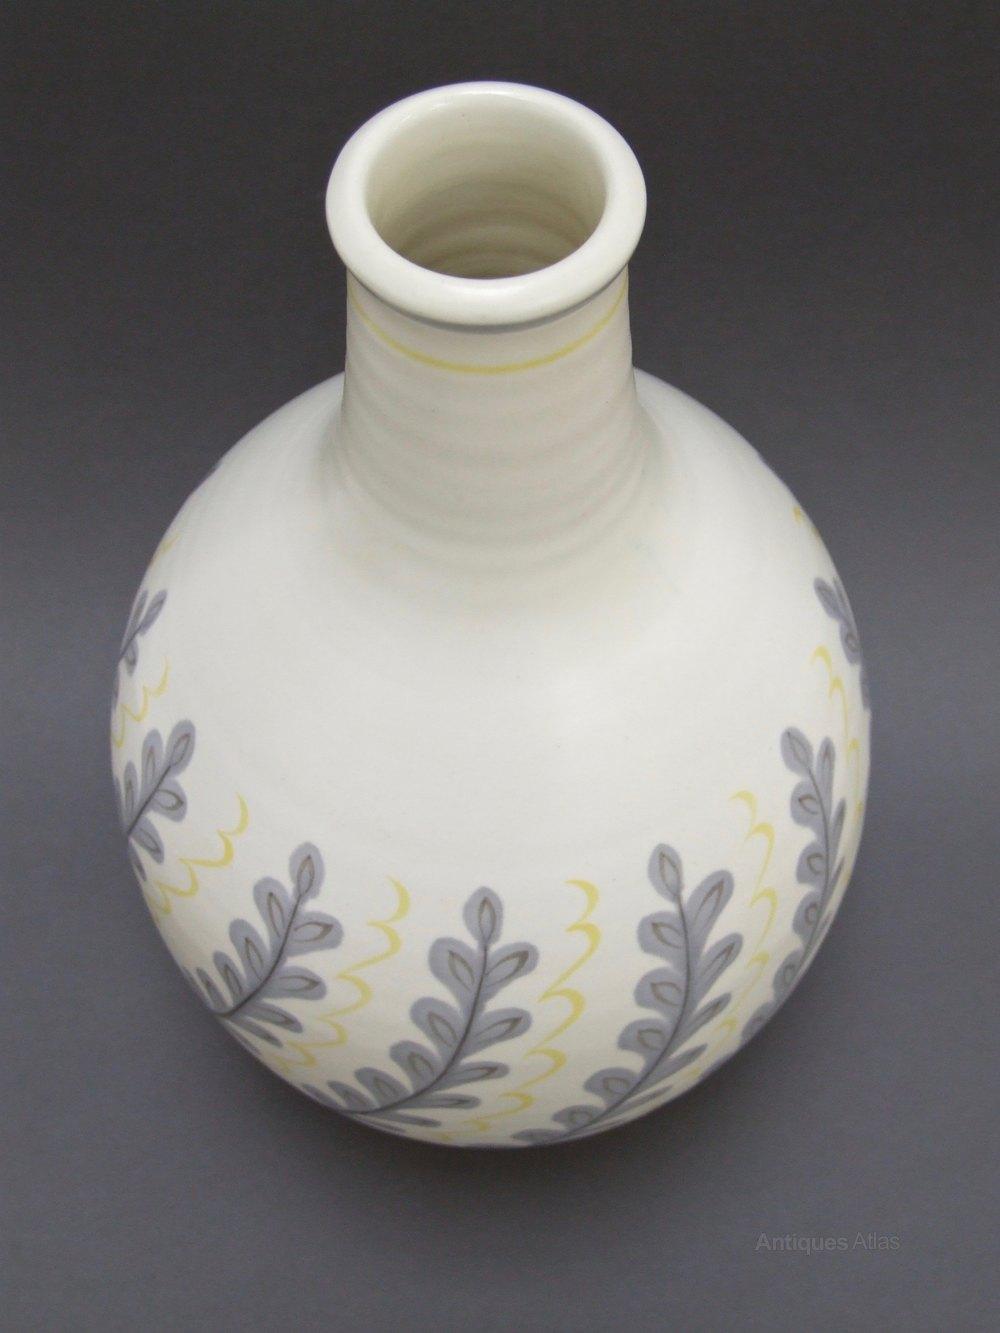 Antiques Atlas Huge Poole Pottery Freeform Vase By